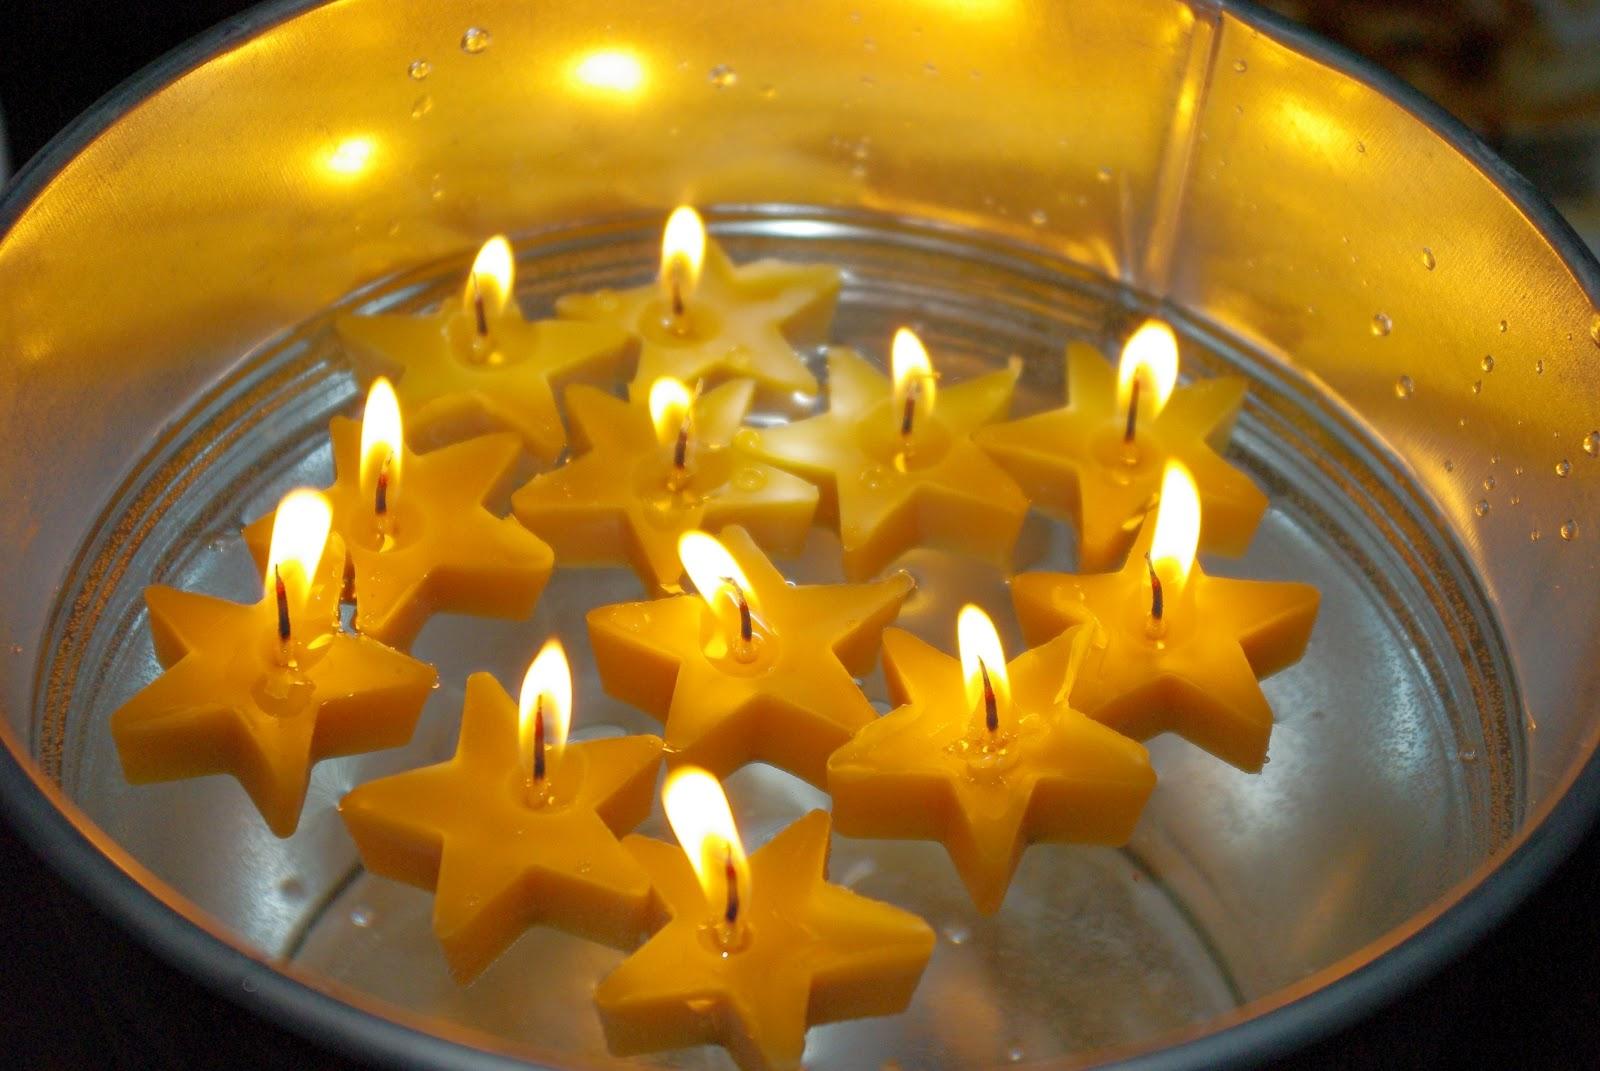 Family Christmas Dinner Ideas Fun Beeswax Candles - ...